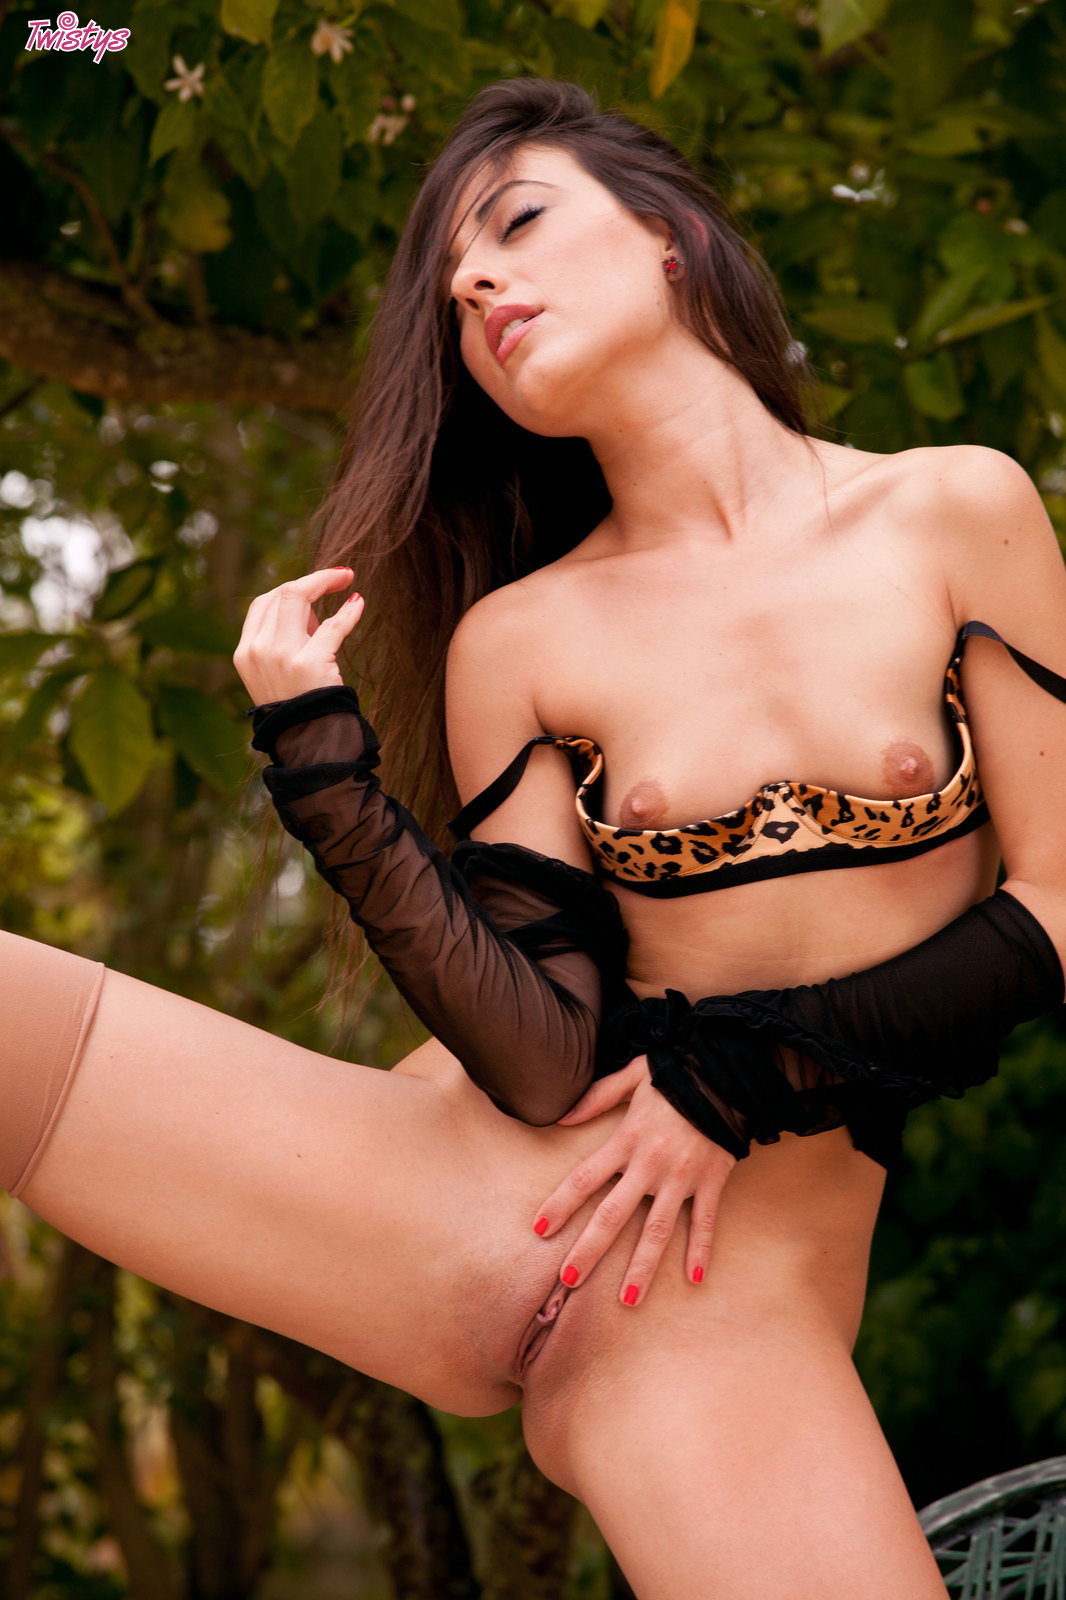 Nude In Stockings